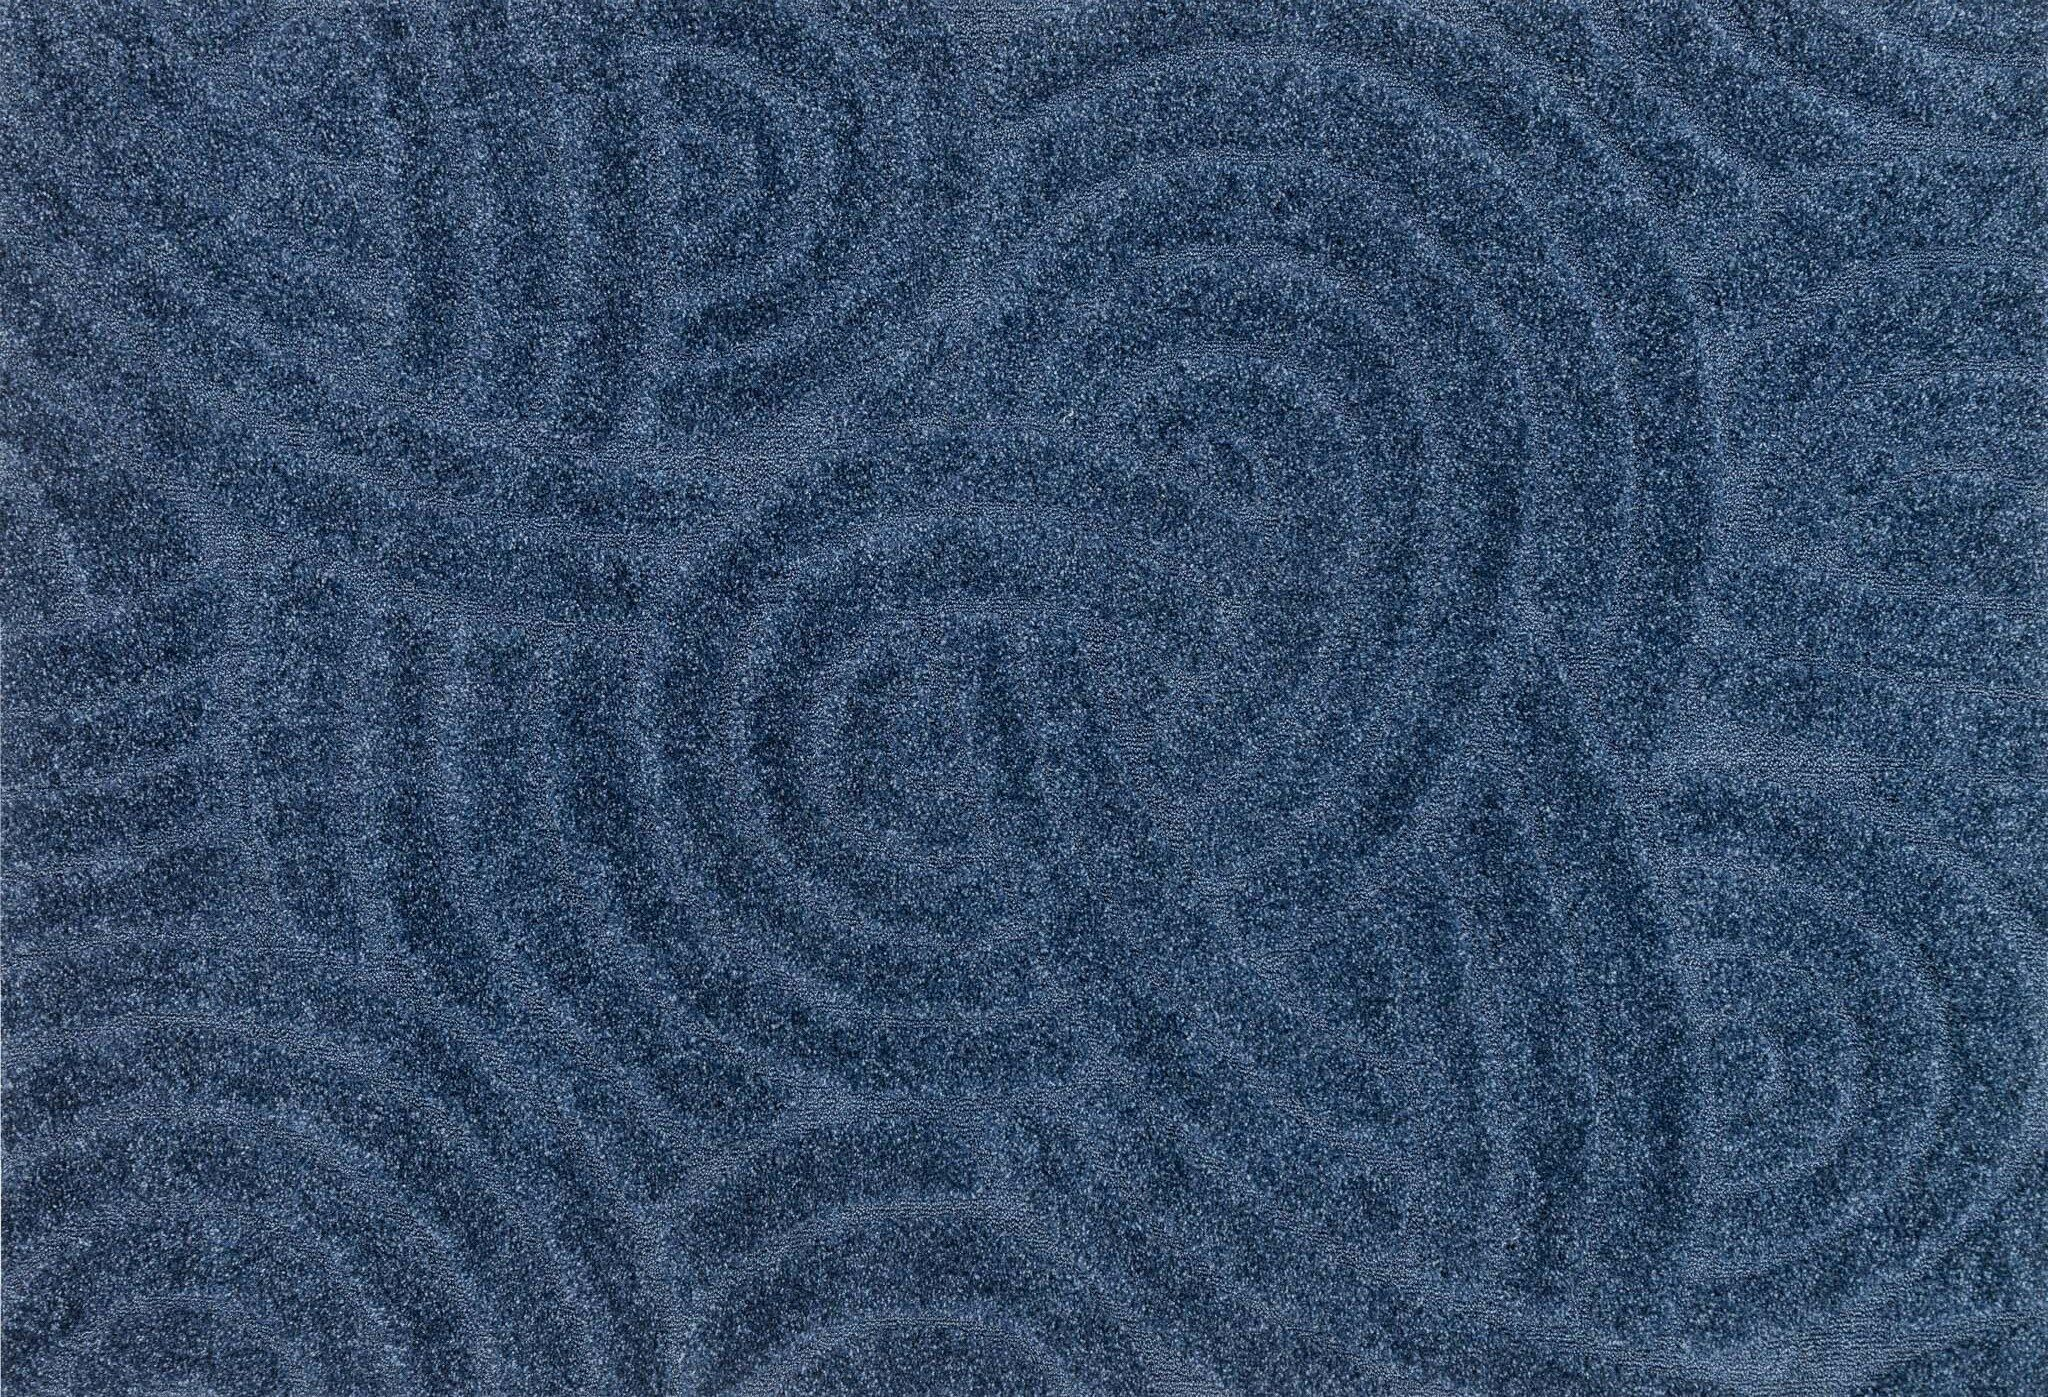 Dania Navy/Light Blue Area Rug Rug Size: Square 7'7